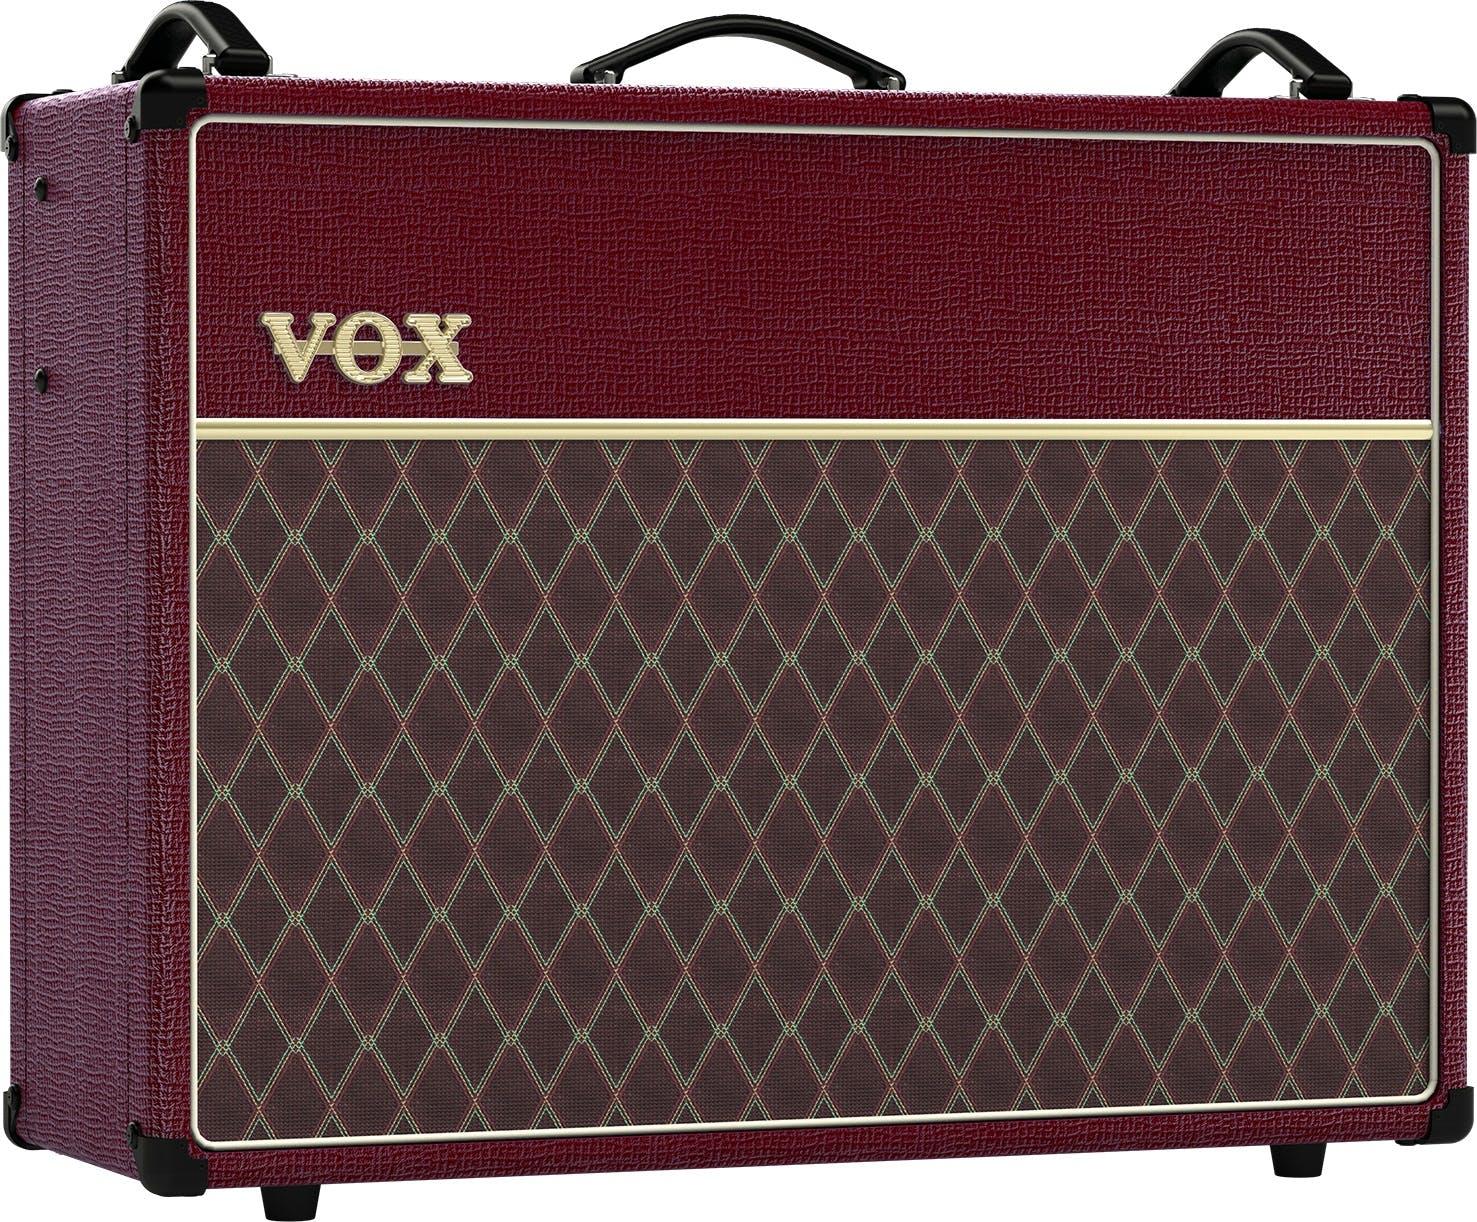 ac30. vox ac30 custom amp in maroon bronco ac30 a